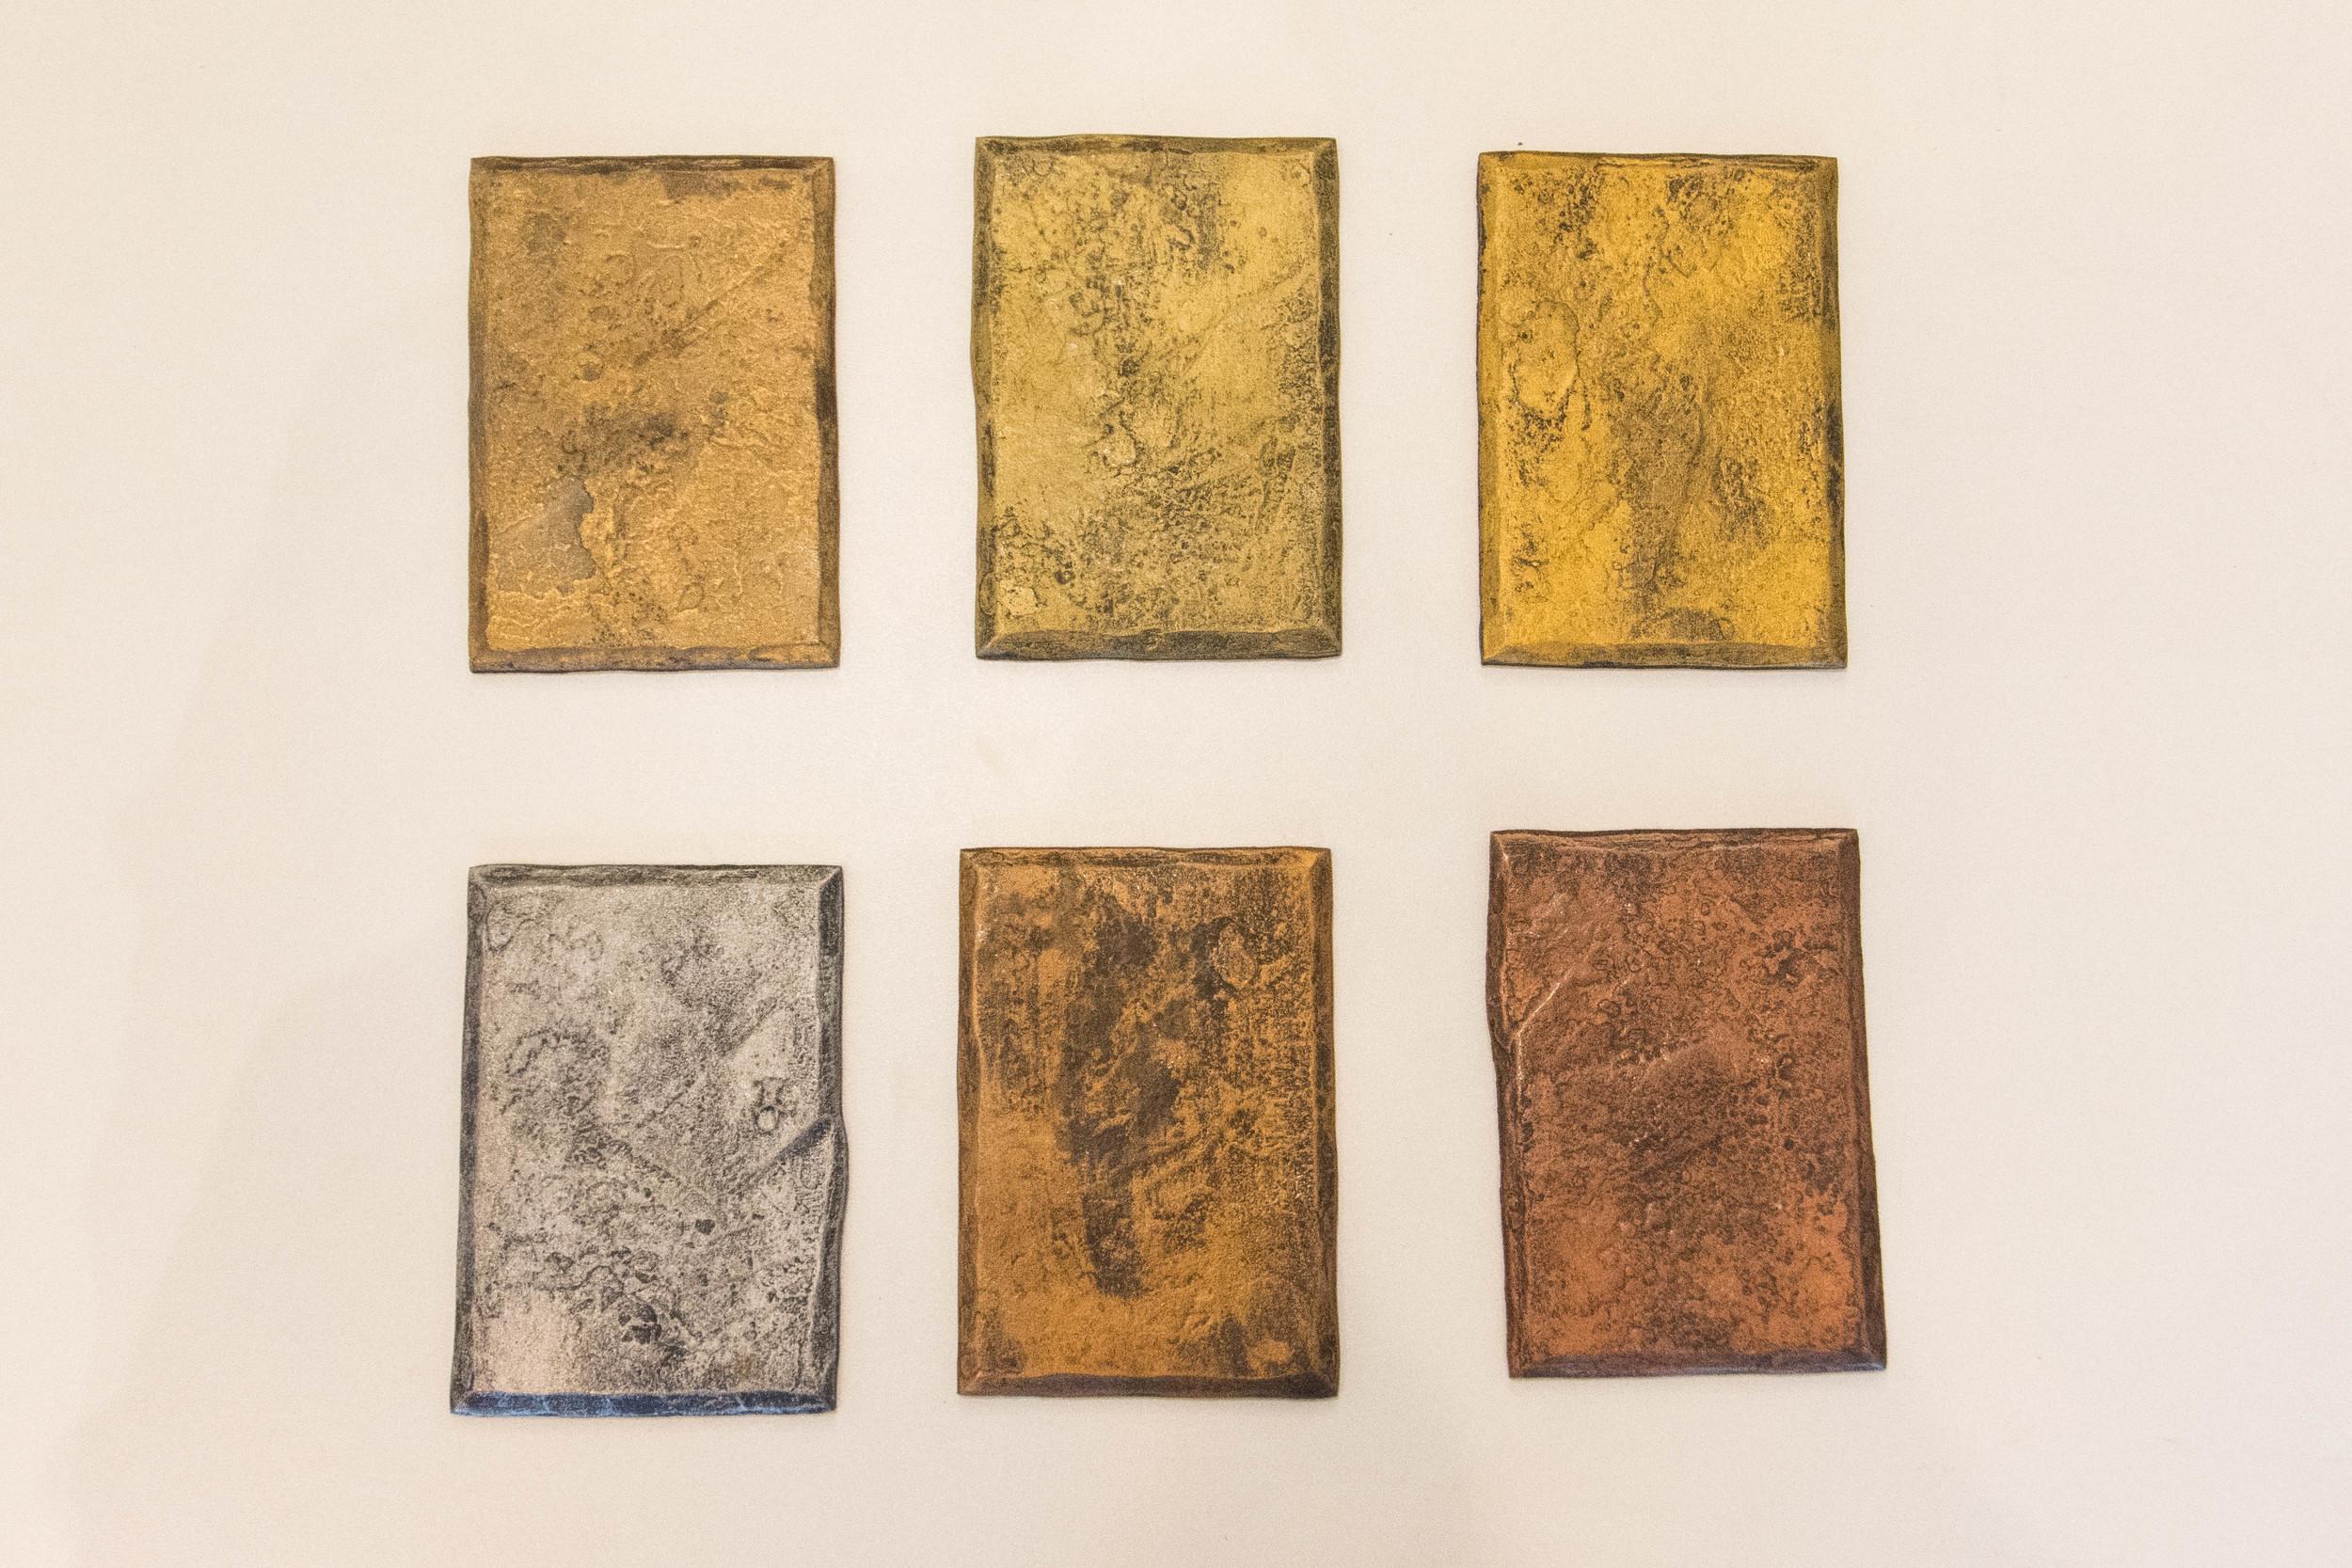 Gilders Paste - Left to Right: Rich Gold, Bronze, Inca Gold, Metallic Silver, Antique Gold, Copper